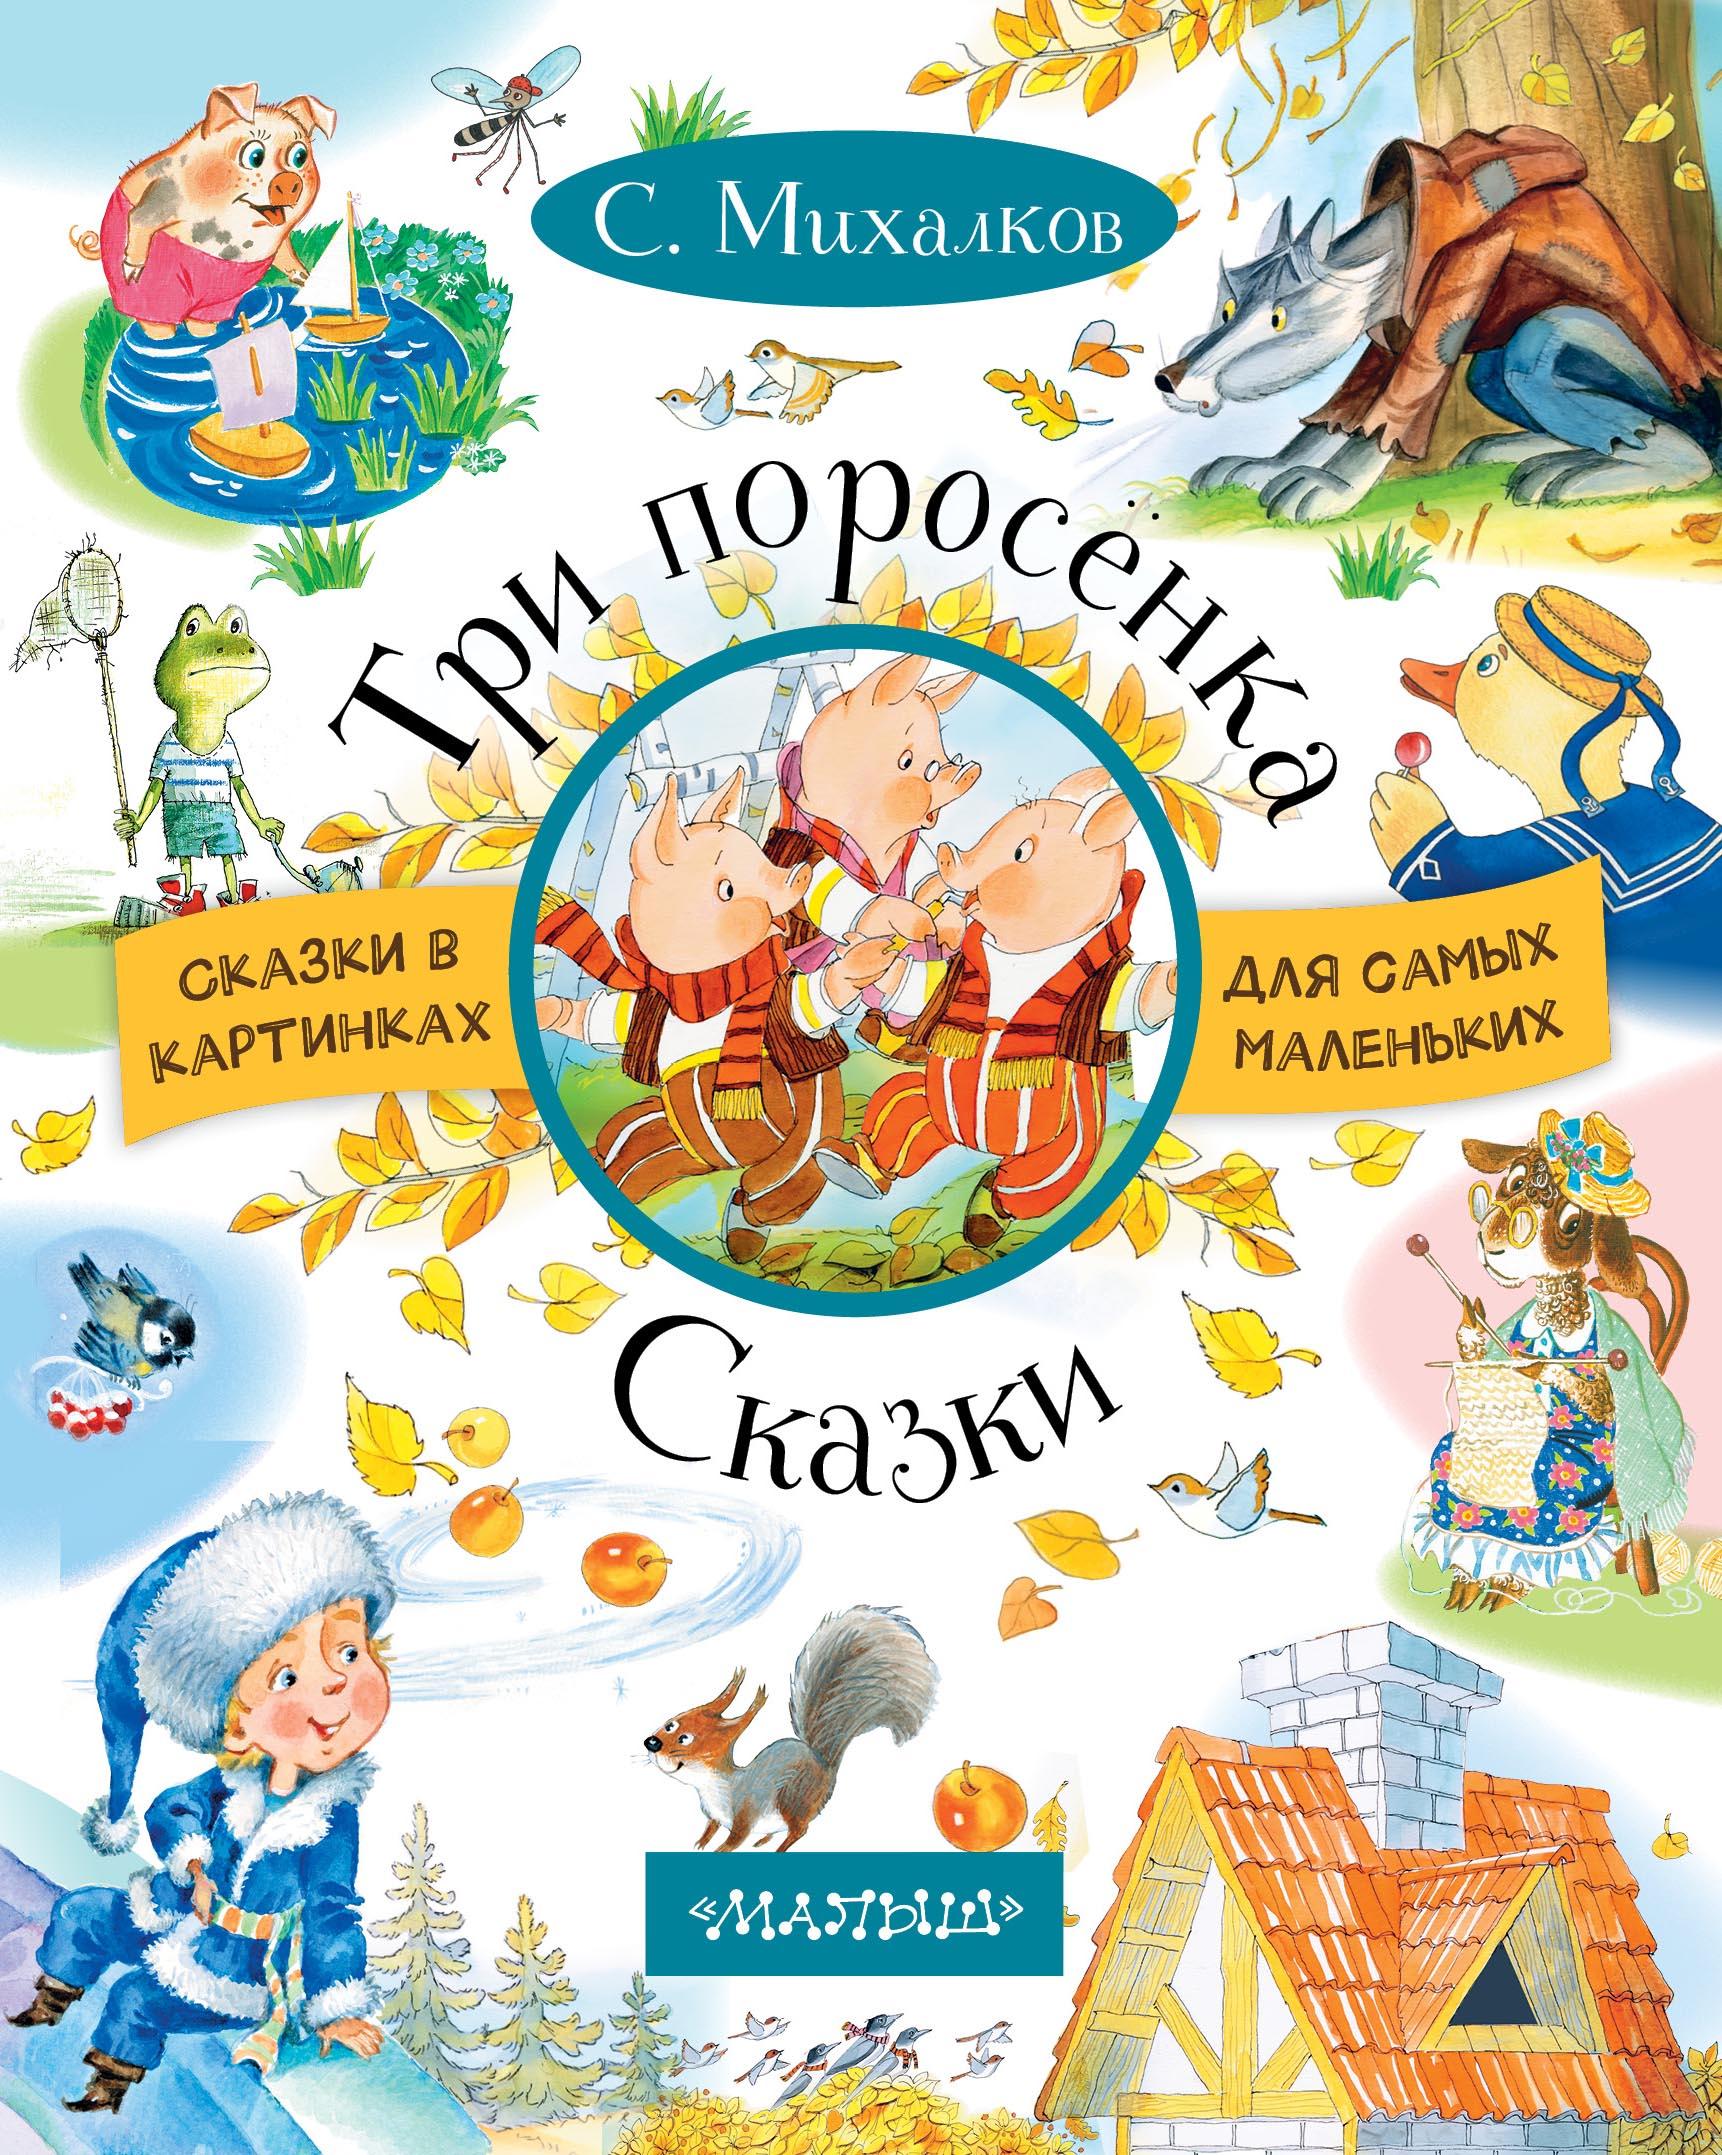 С. Михалков Три поросенка. Сказки якимова и зуев и худ три поросенка сказки